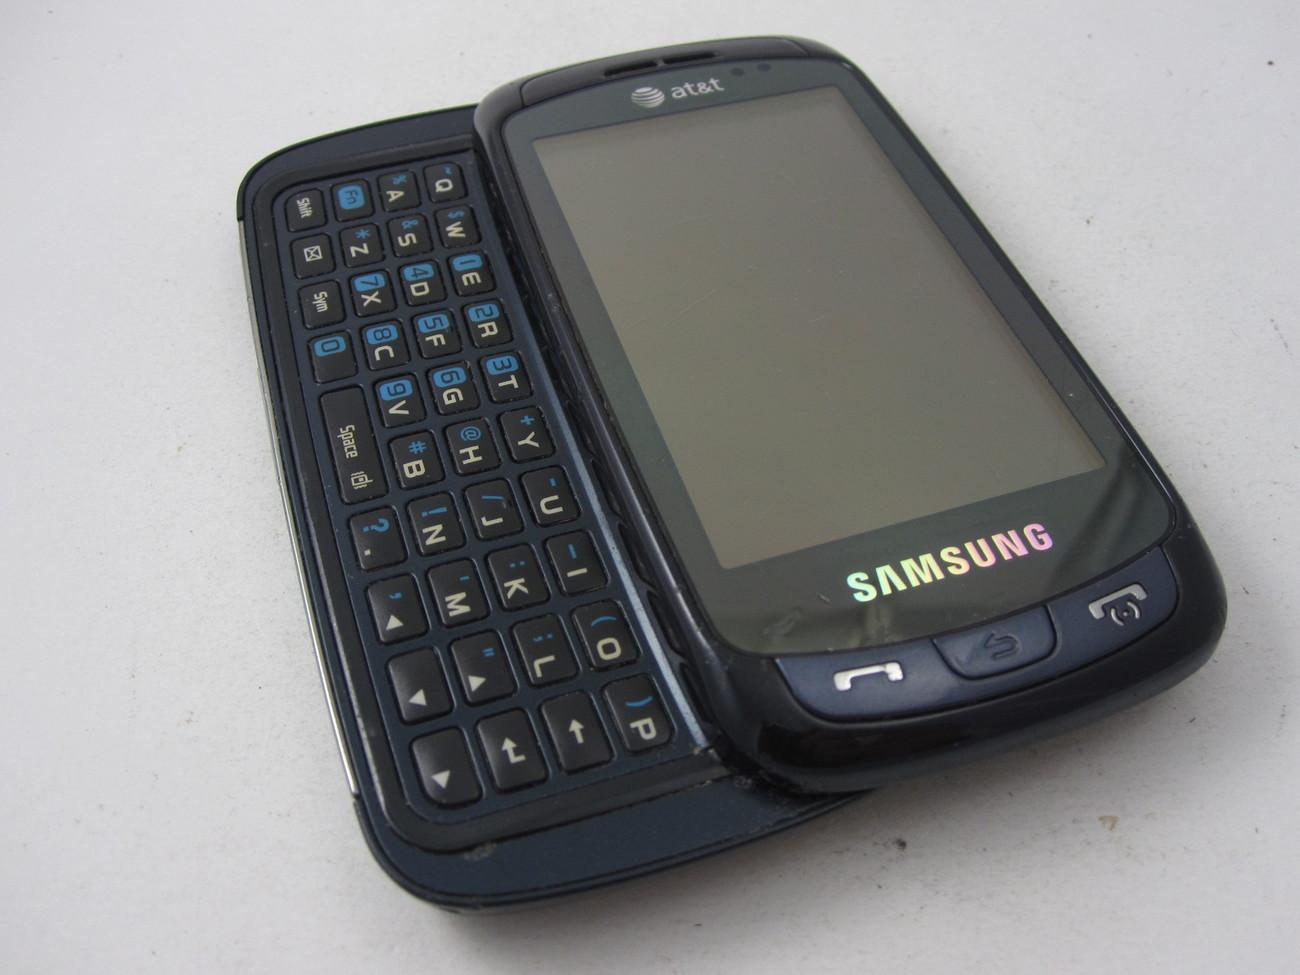 Samsung impression phone